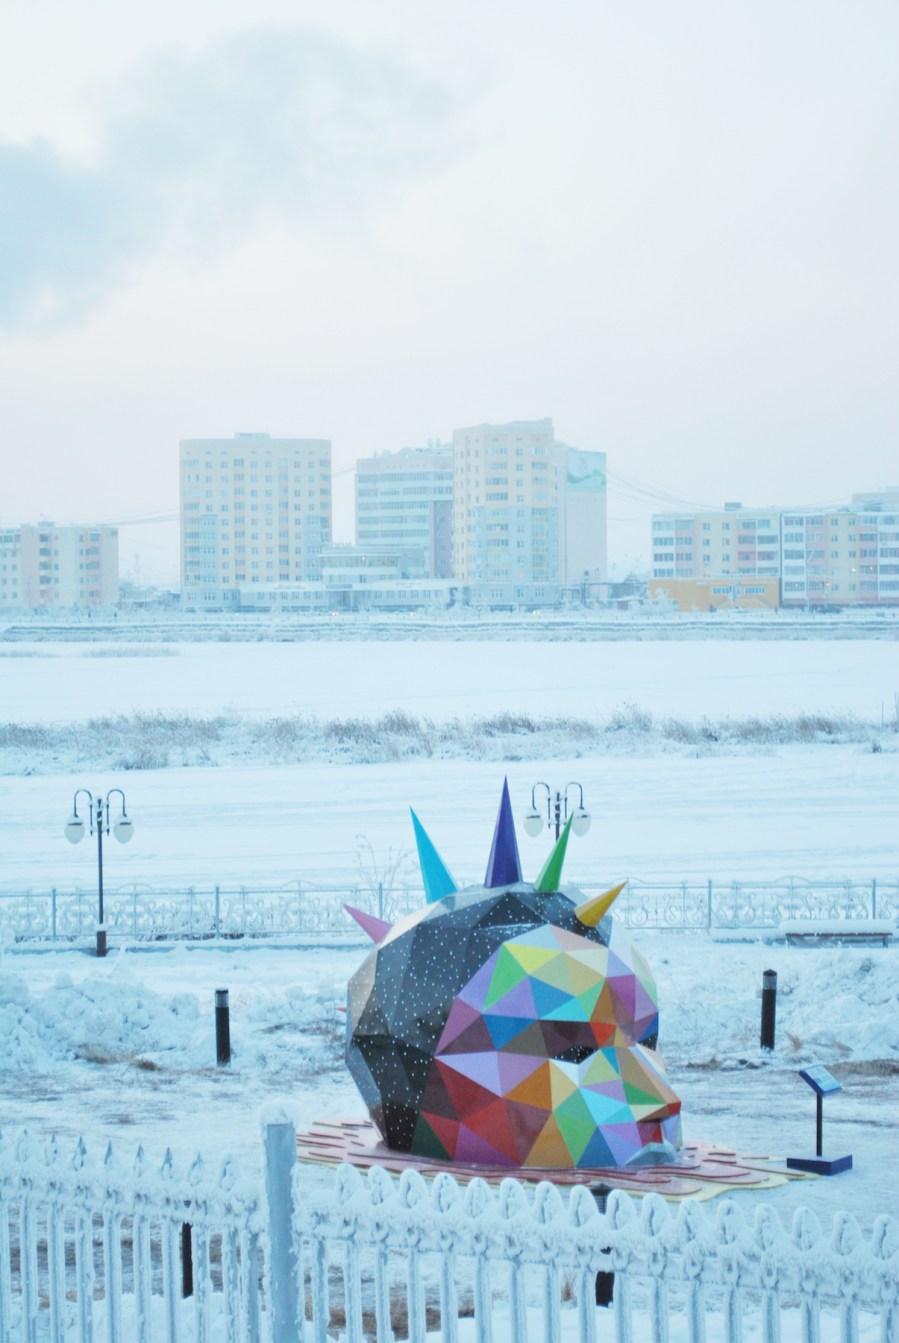 okuda-street-art-sculpture-yakutsk-russia-snow-9